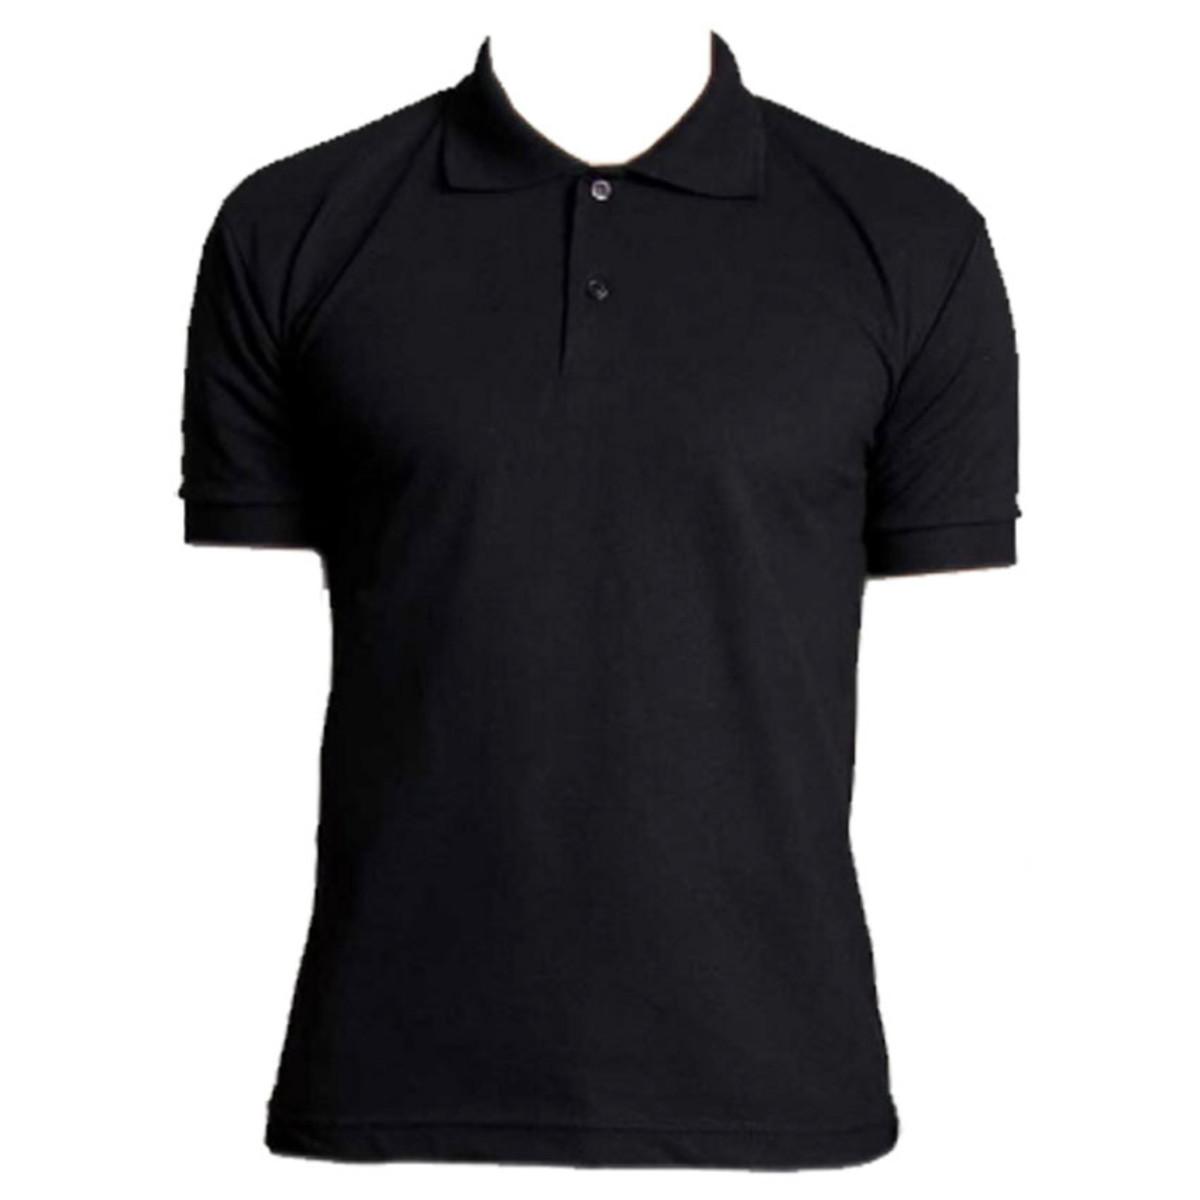 386a2330c0c51c Camisa Polo Masculino Preta Marinho Masson no Elo7 | Masson ...